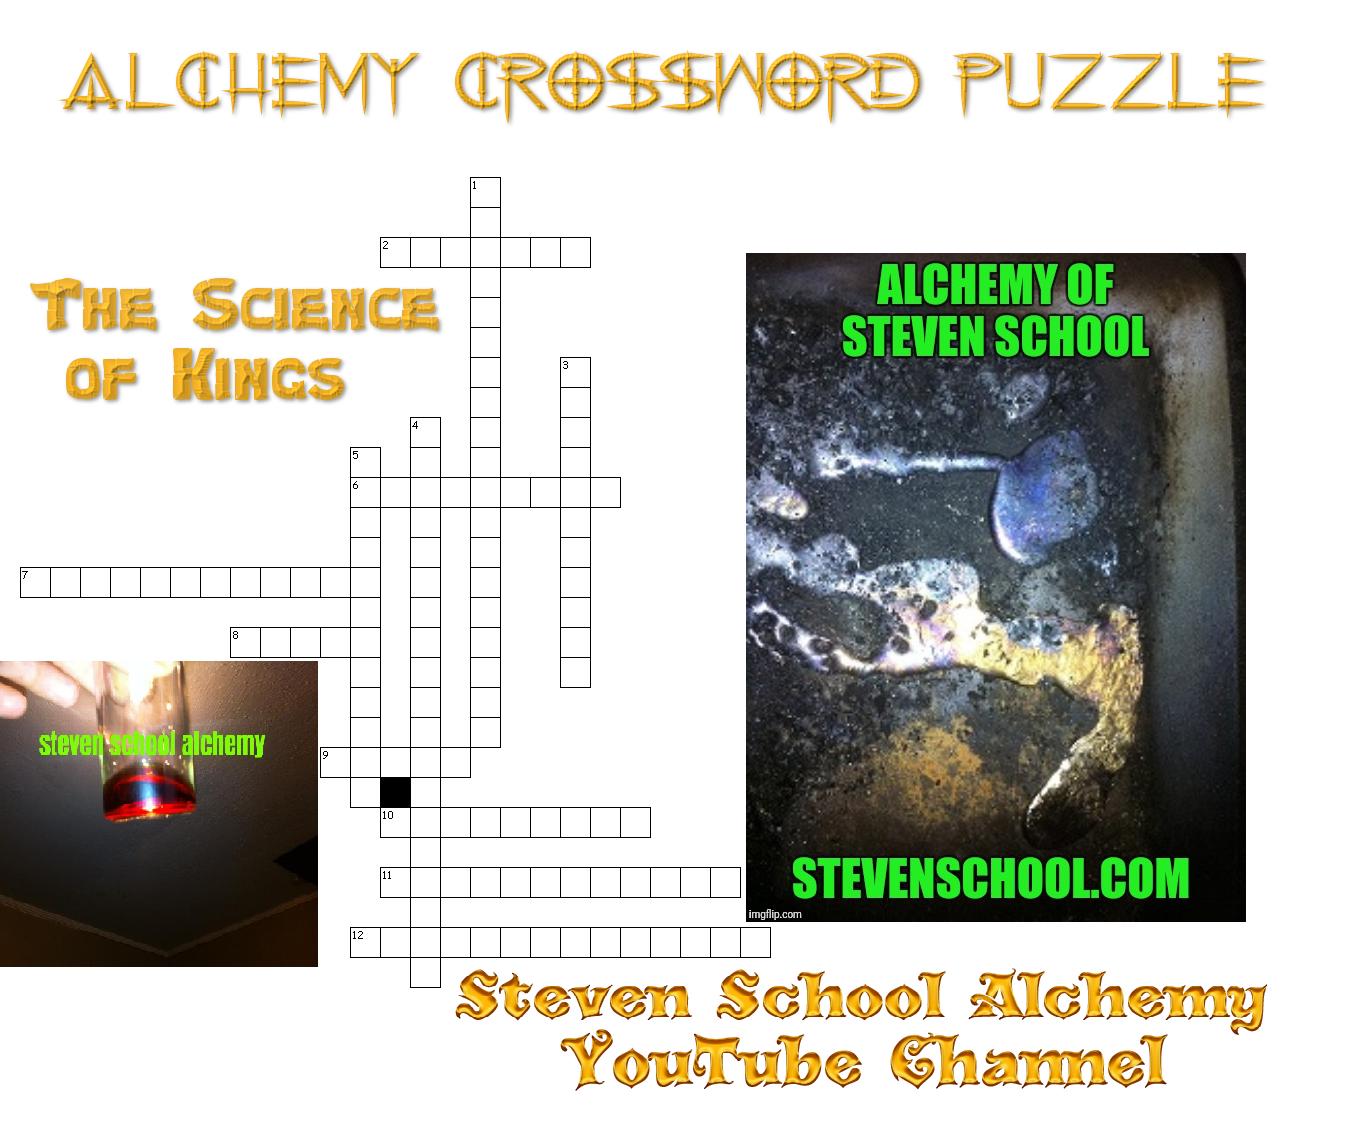 alchemy crossword puzzle